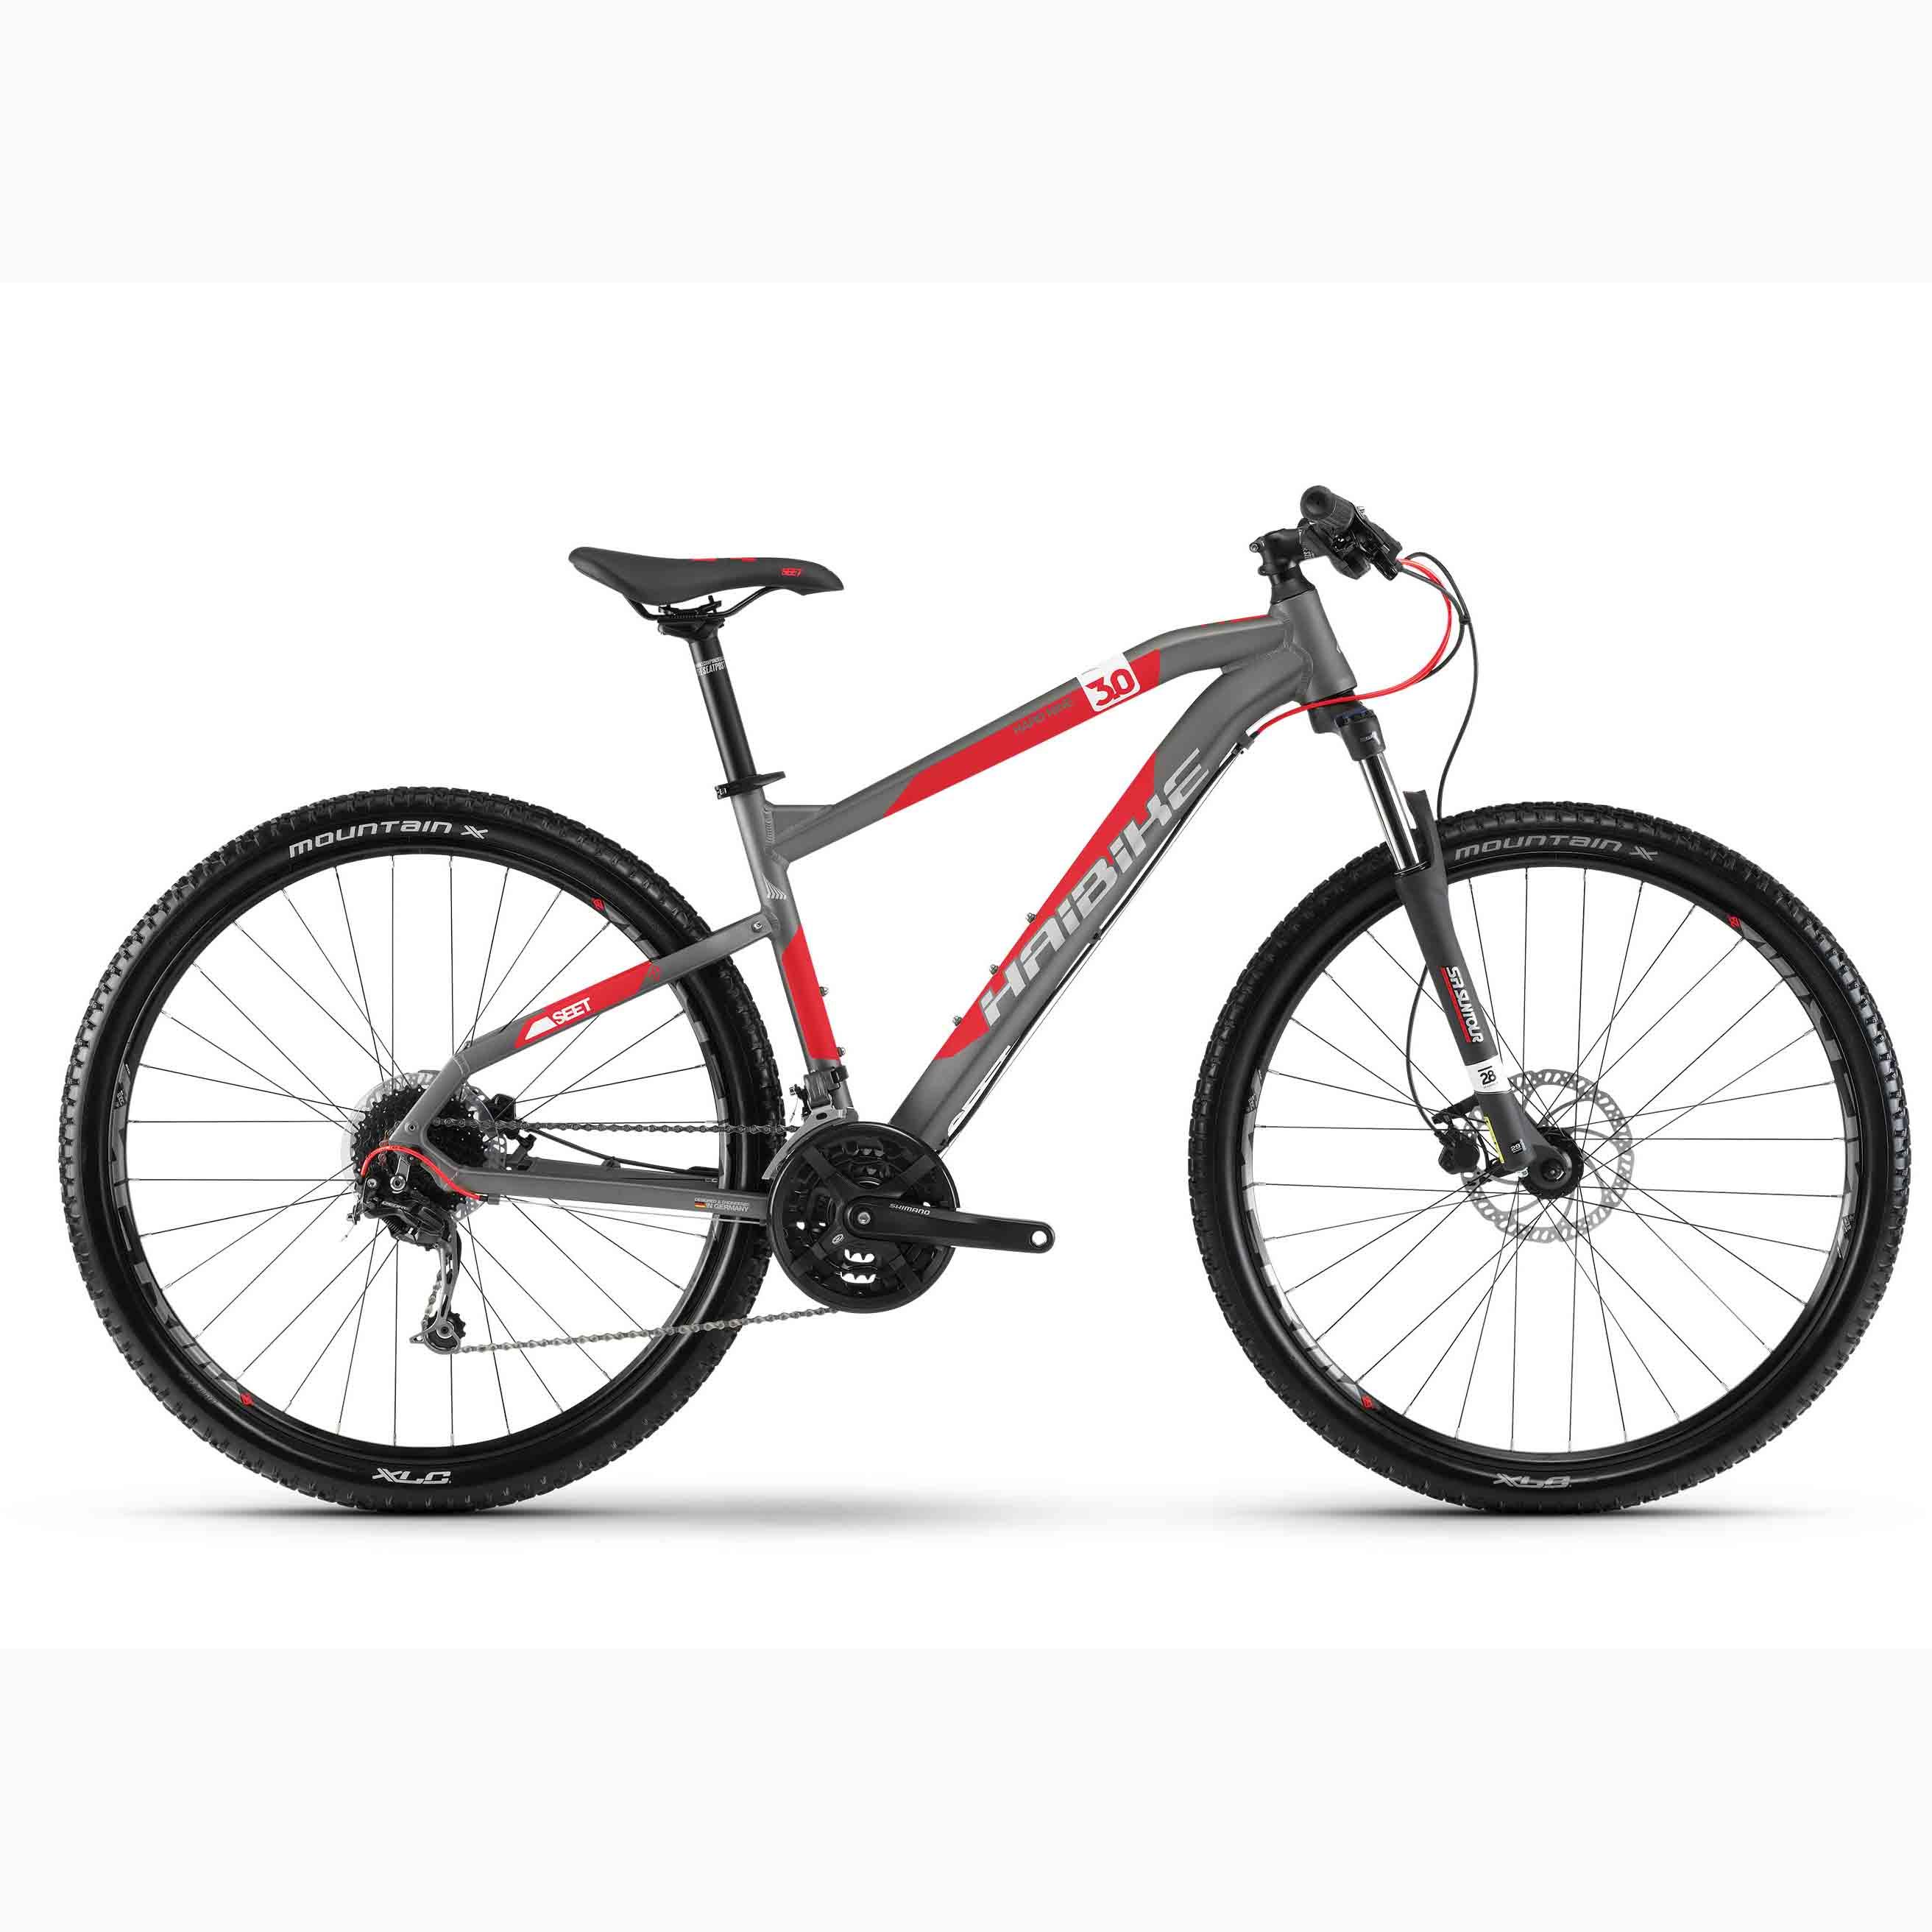 Фото Велосипед Haibike SEET HardNine 3.0 29″, рама 45см, 2018